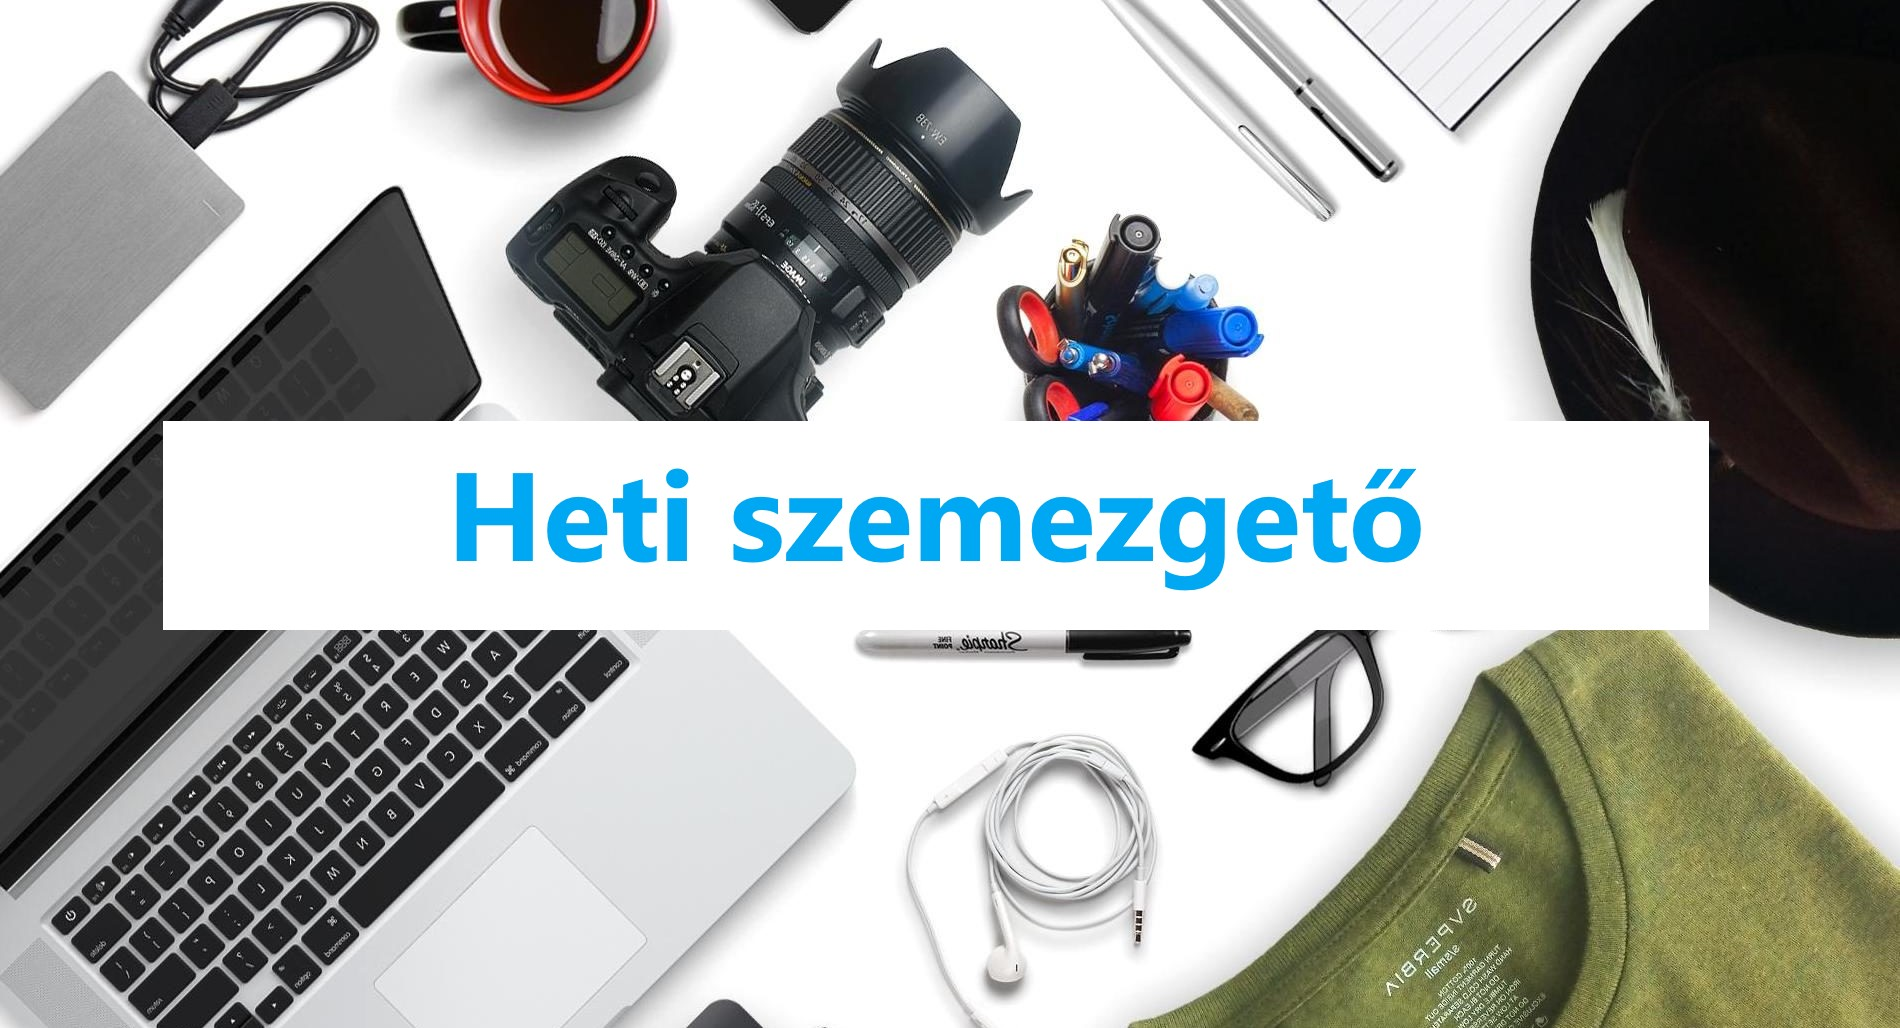 heti_szemezgeto_uj_40.jpg